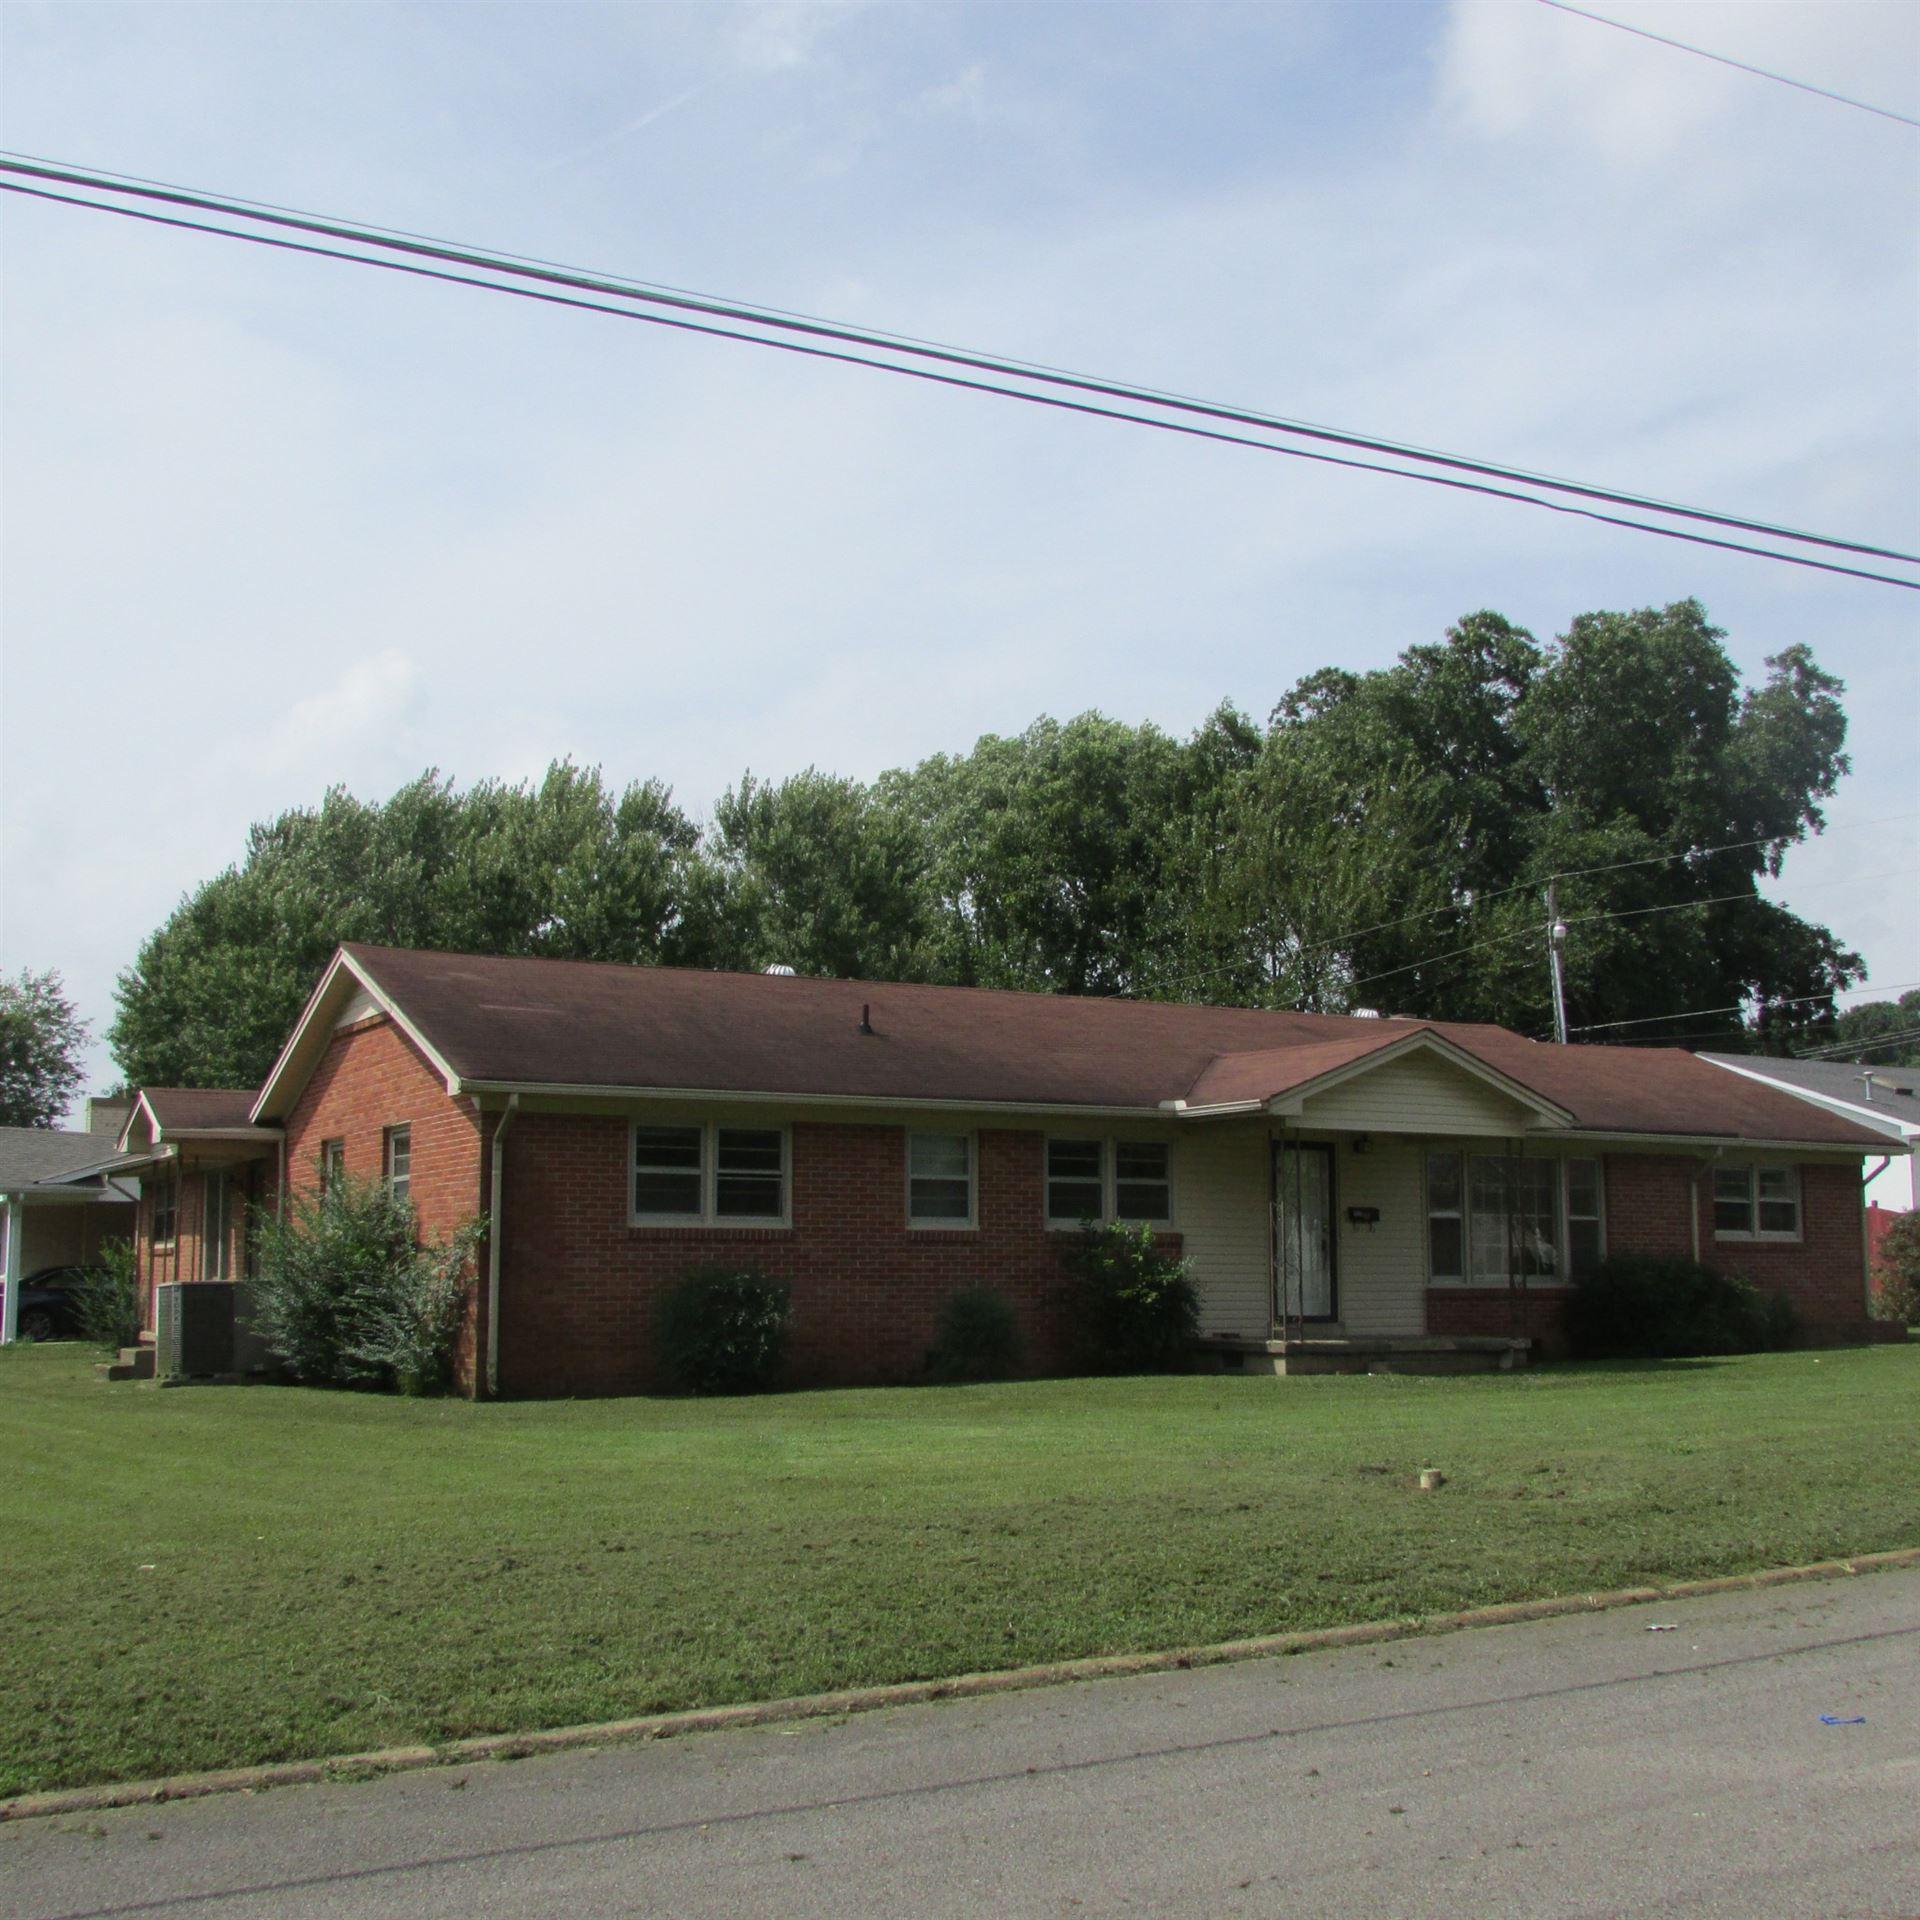 1101 2nd Ave N, Lawrenceburg, TN 38464 - MLS#: 2185747